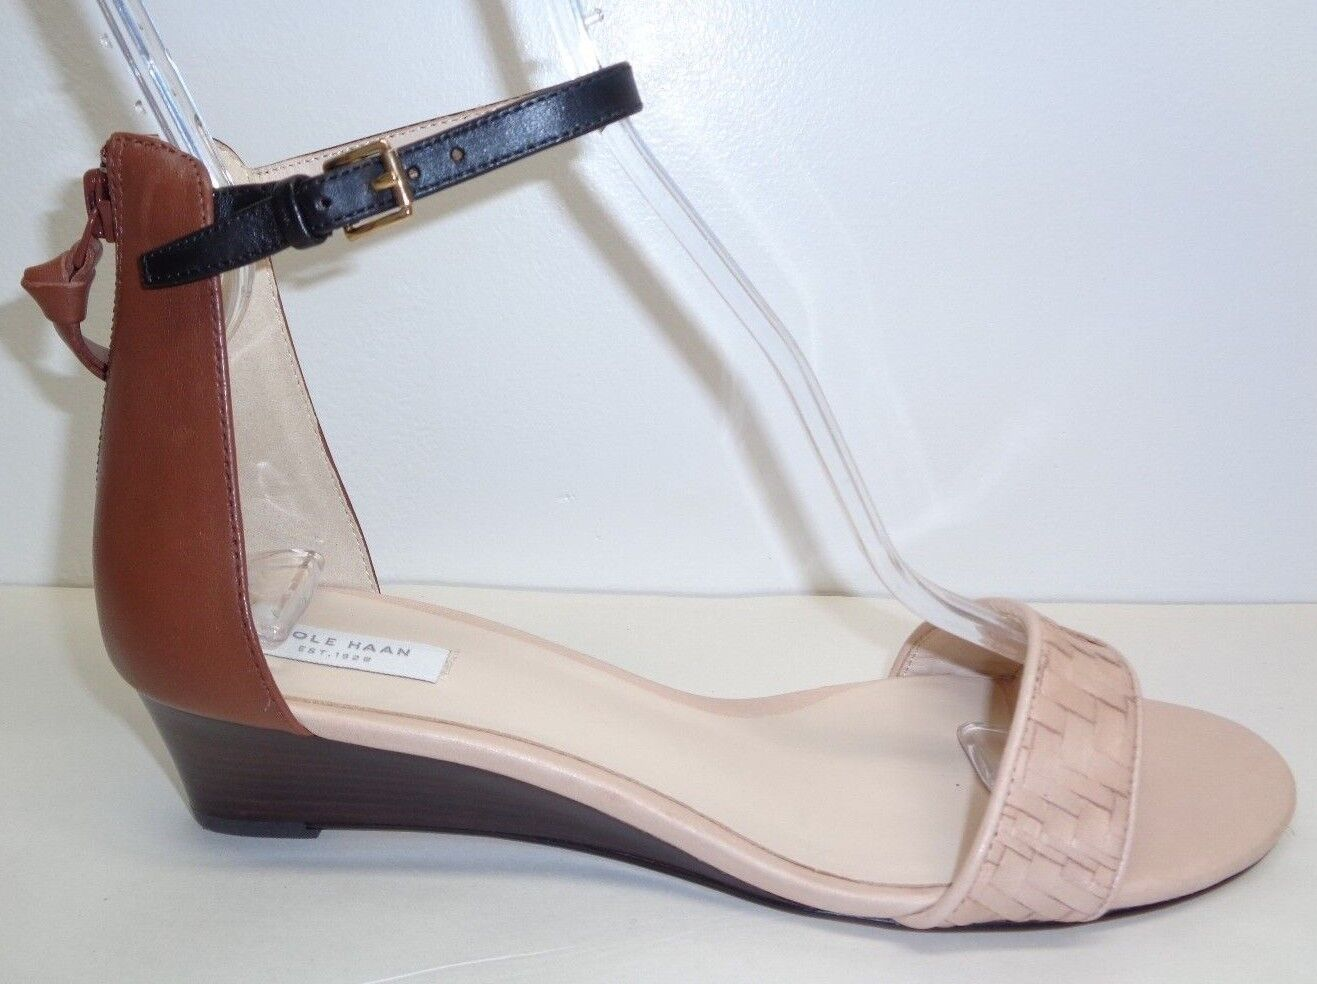 Cole Haan Größe 7.5 M GENEVIEVE WEAVE Tan Leder Wedge Sandales NEU Damenschuhe Schuhes